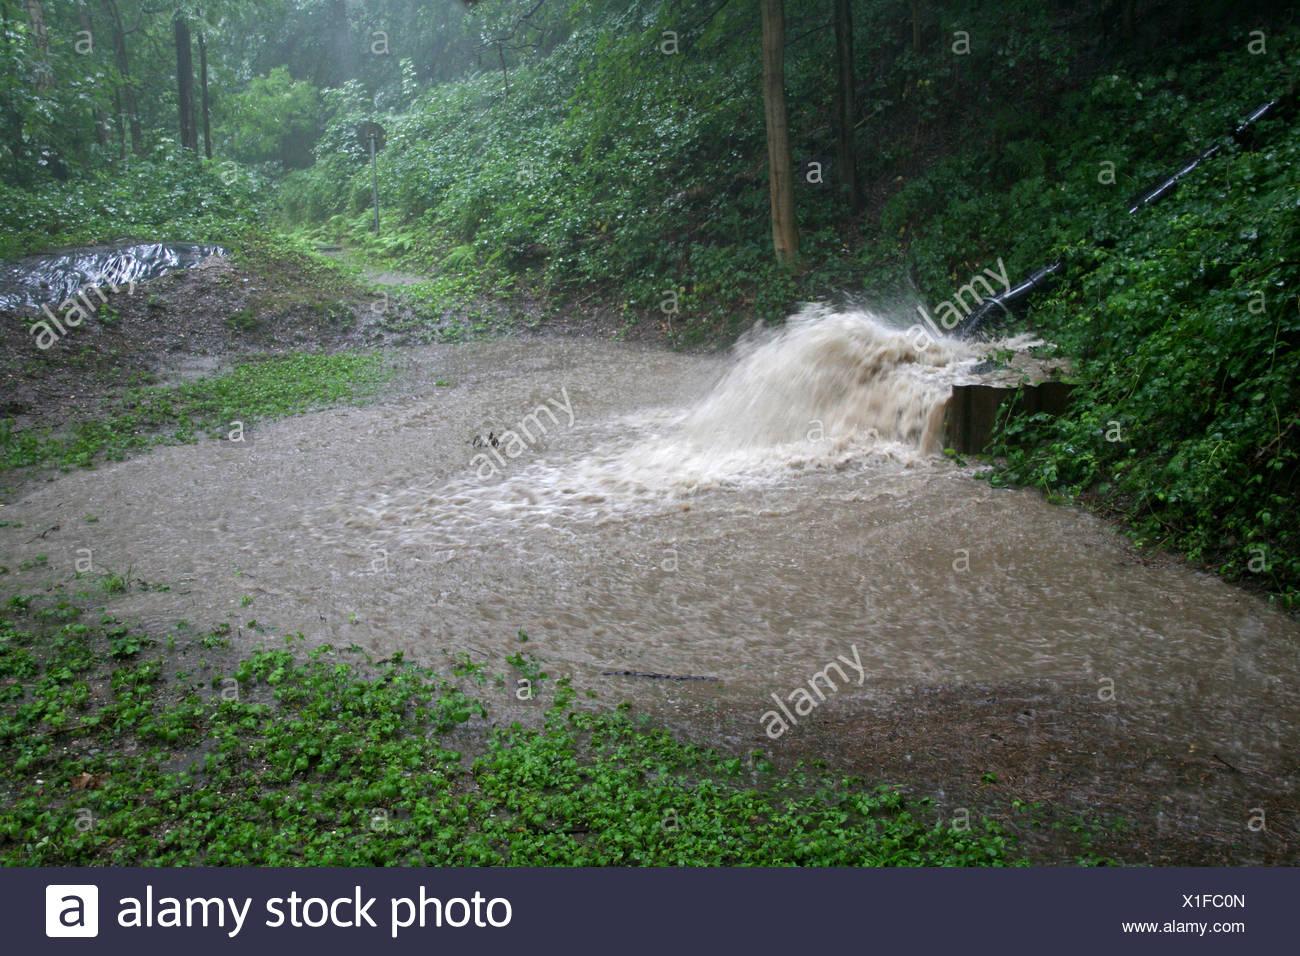 mass of water flooding a rainwater retention basin, Germany, North Rhine-Westphalia - Stock Image